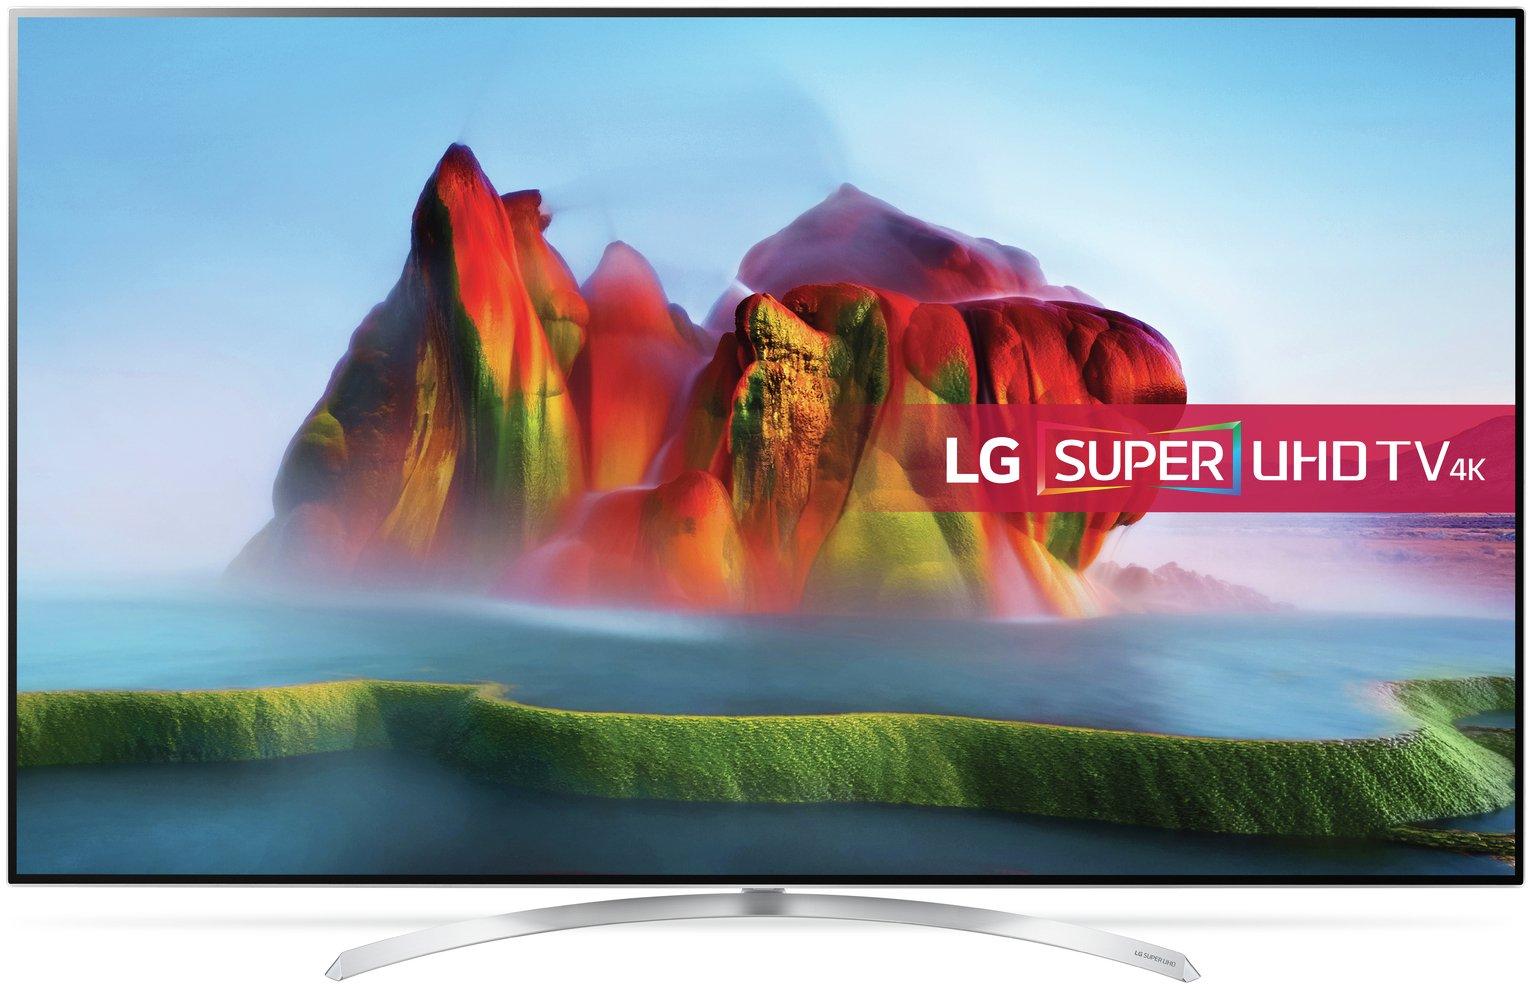 LG 55SJ950V 55 Inch Smart 4K Ultra HD TV with HDR